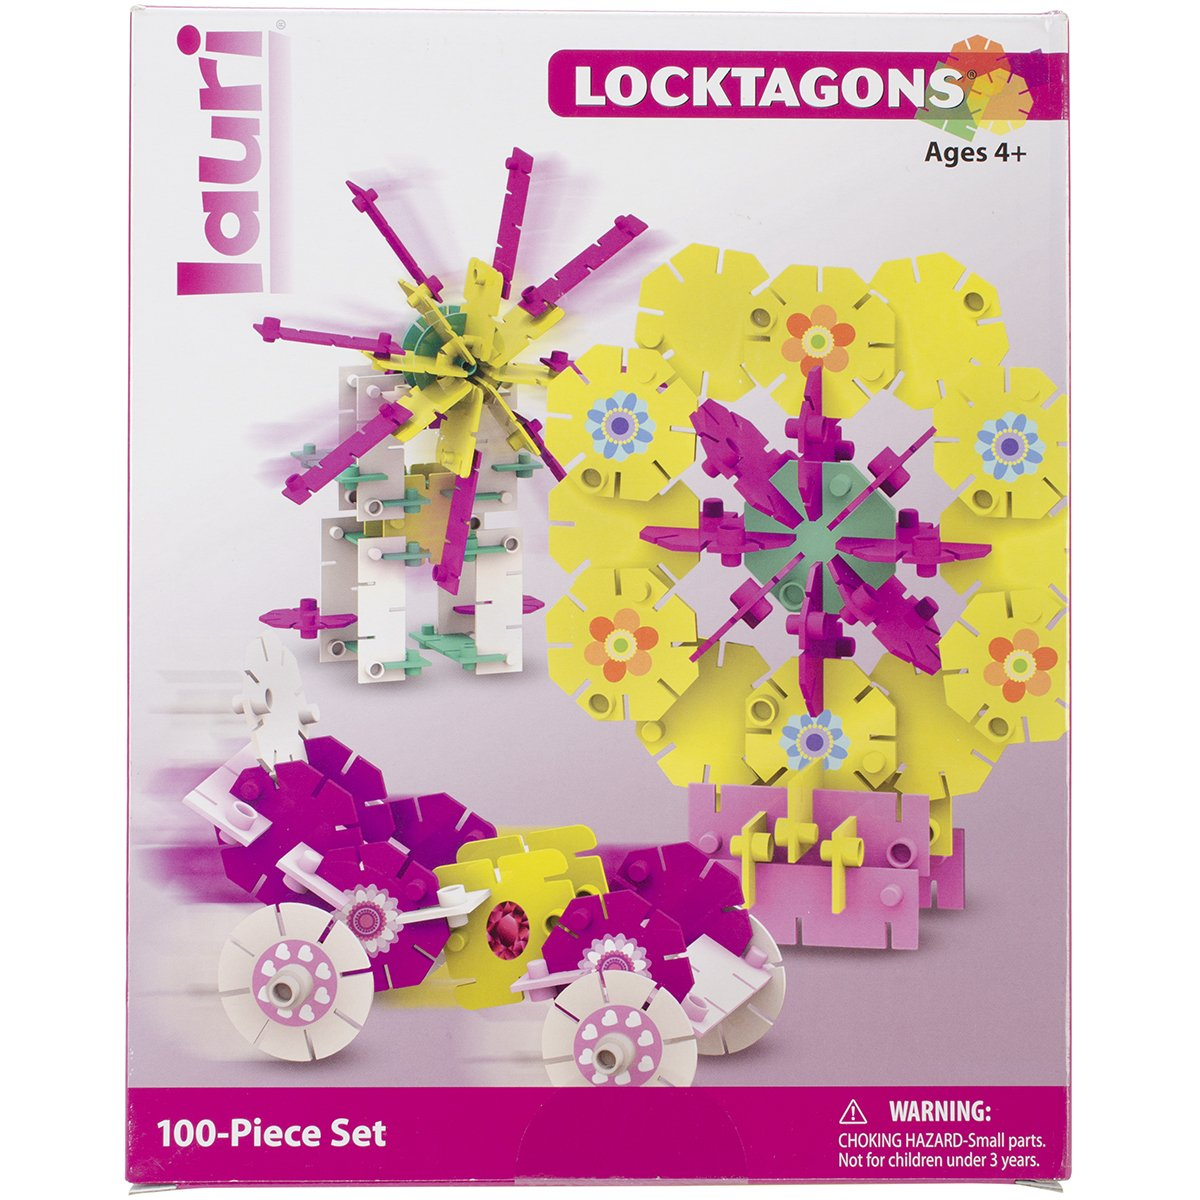 Locktagons Toy